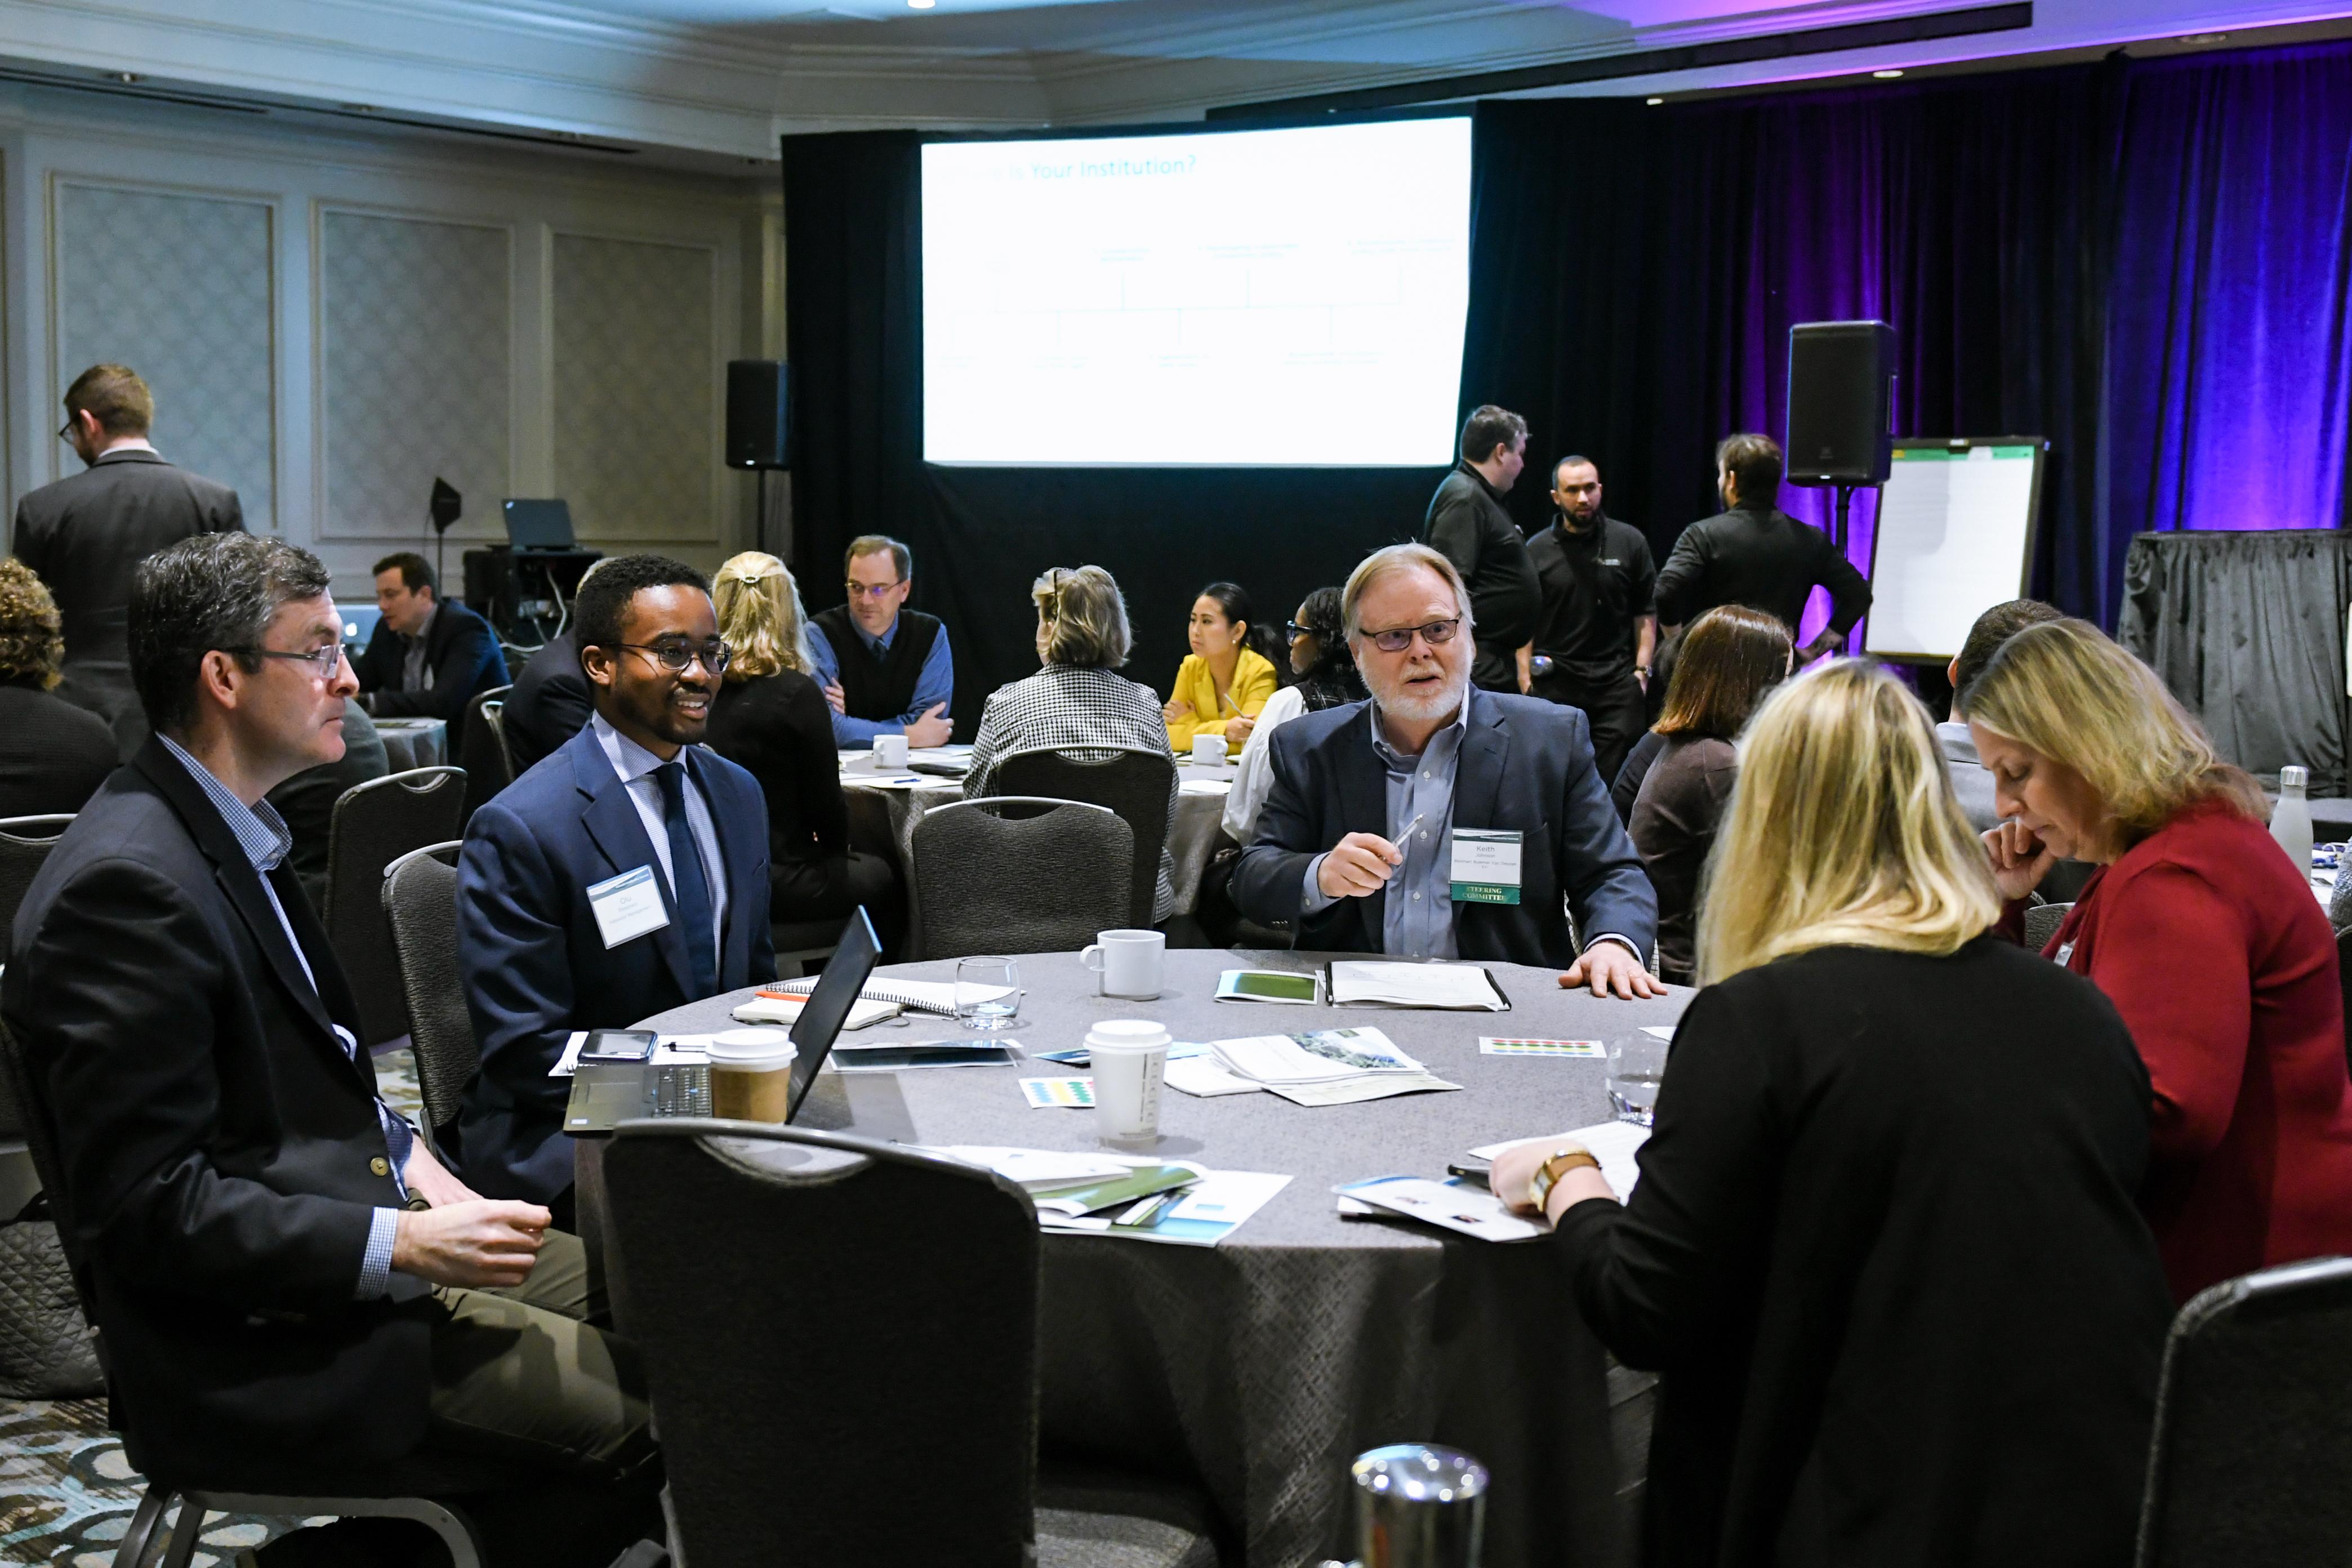 participants discuss investing topics at a table